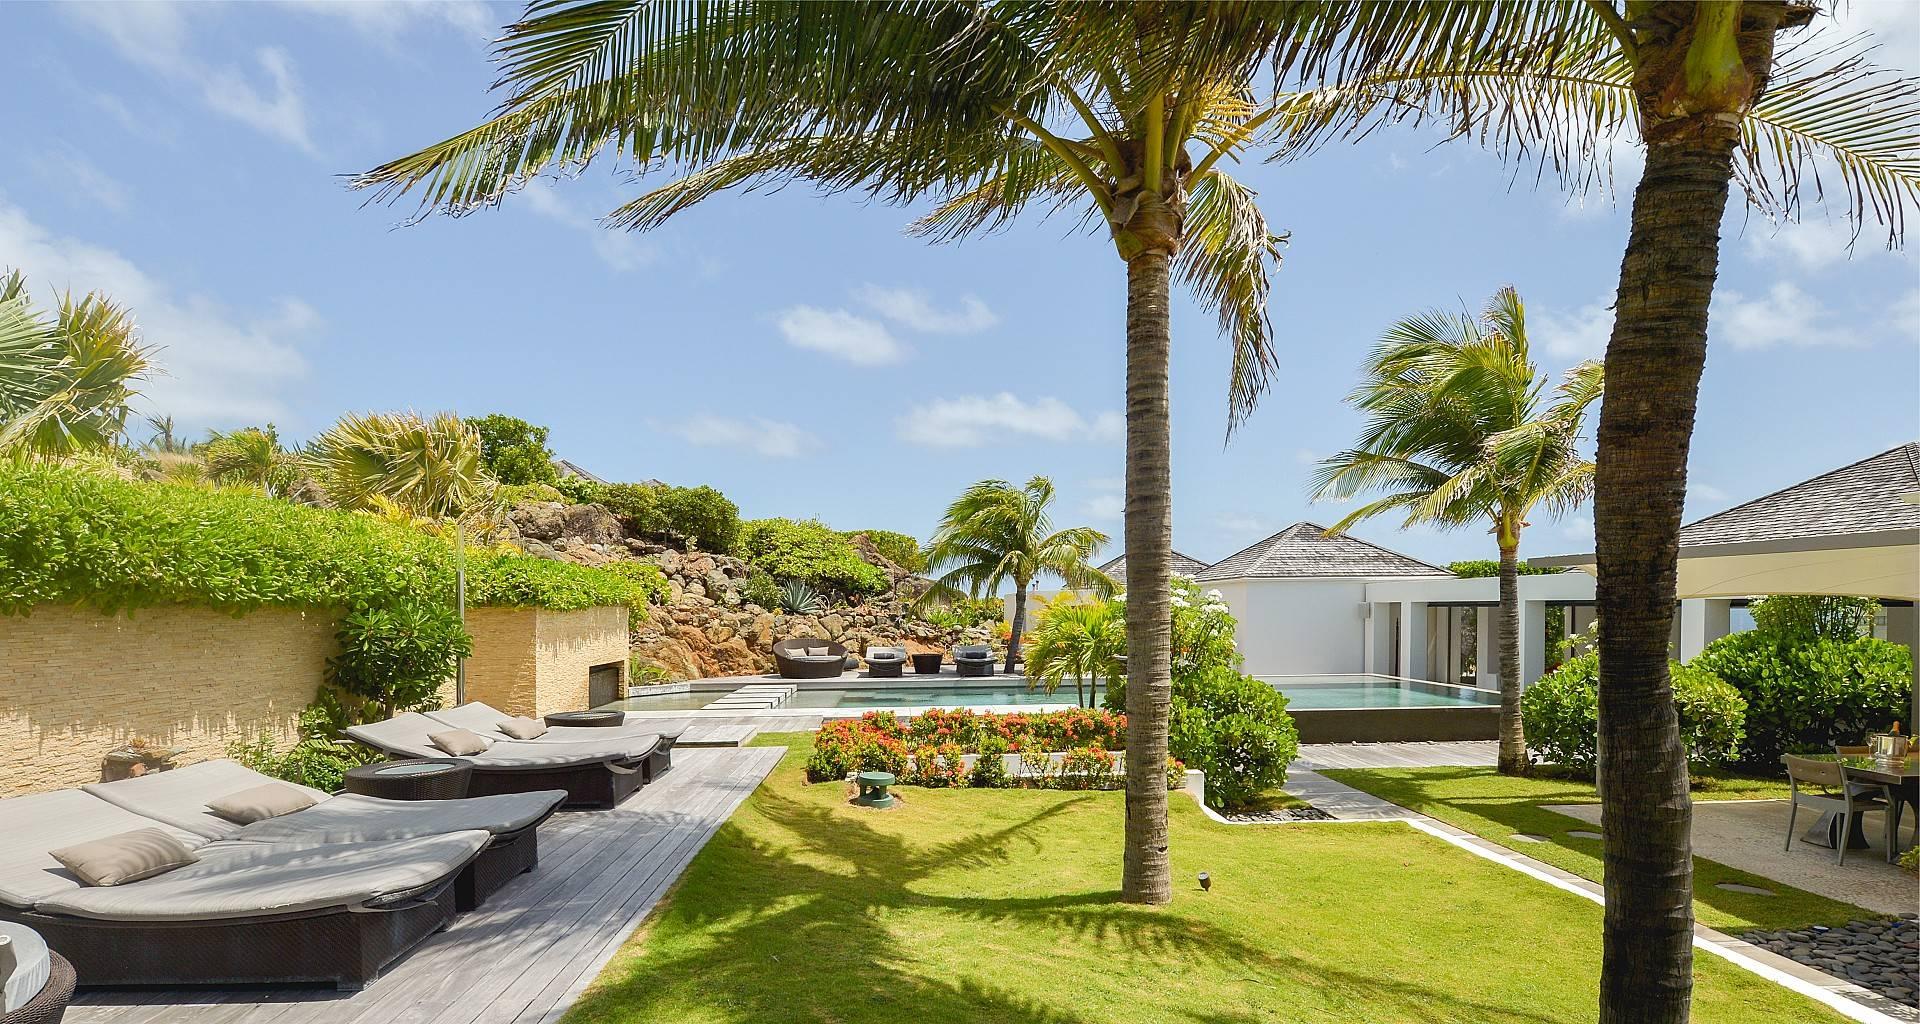 Villa Casa del Mar Outside